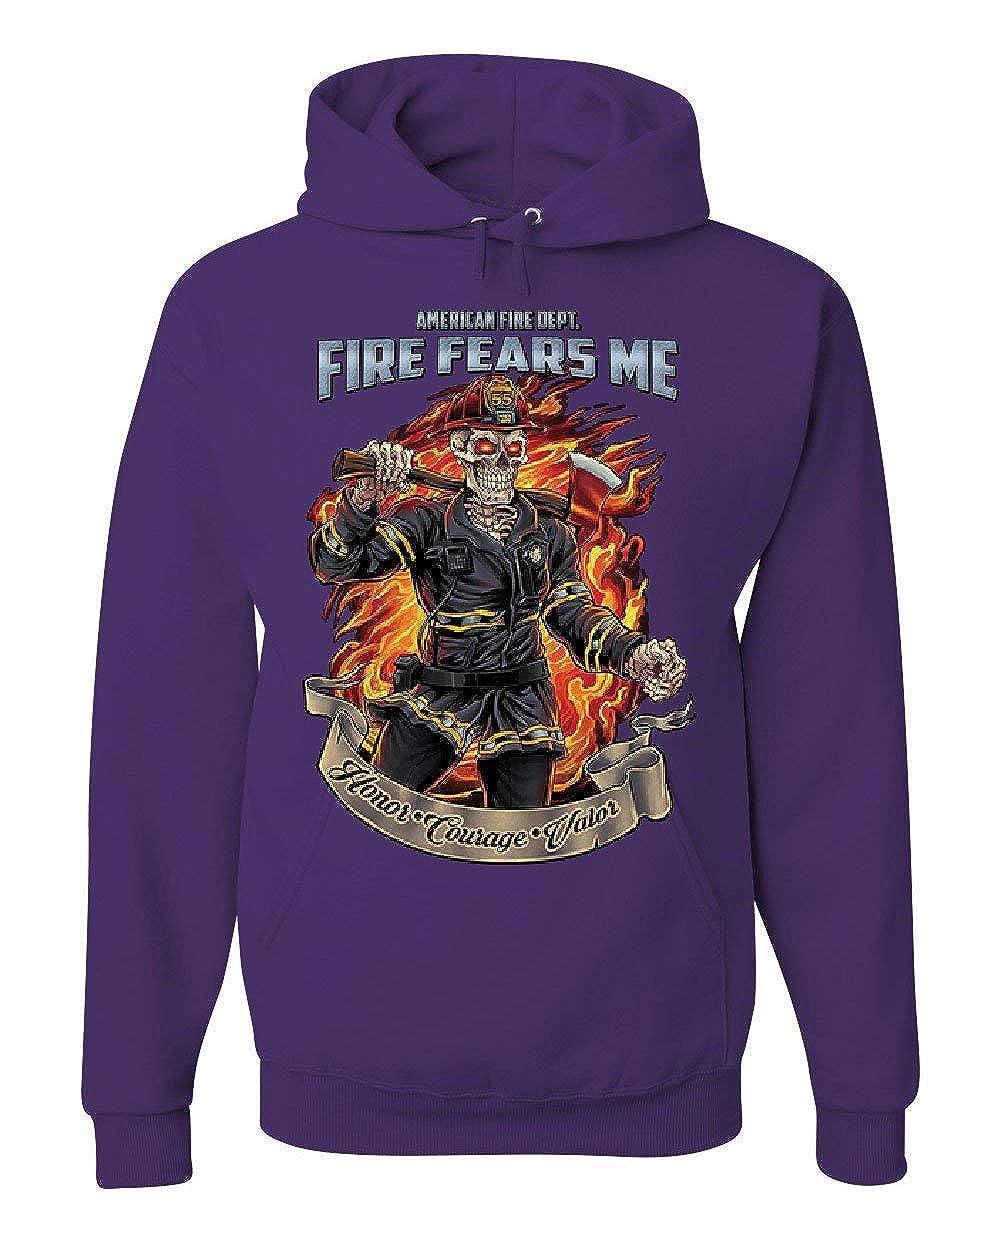 Fire Fears Me Hoodie Firefighter Fire Dept Honor Courage Valor Sweatshirt